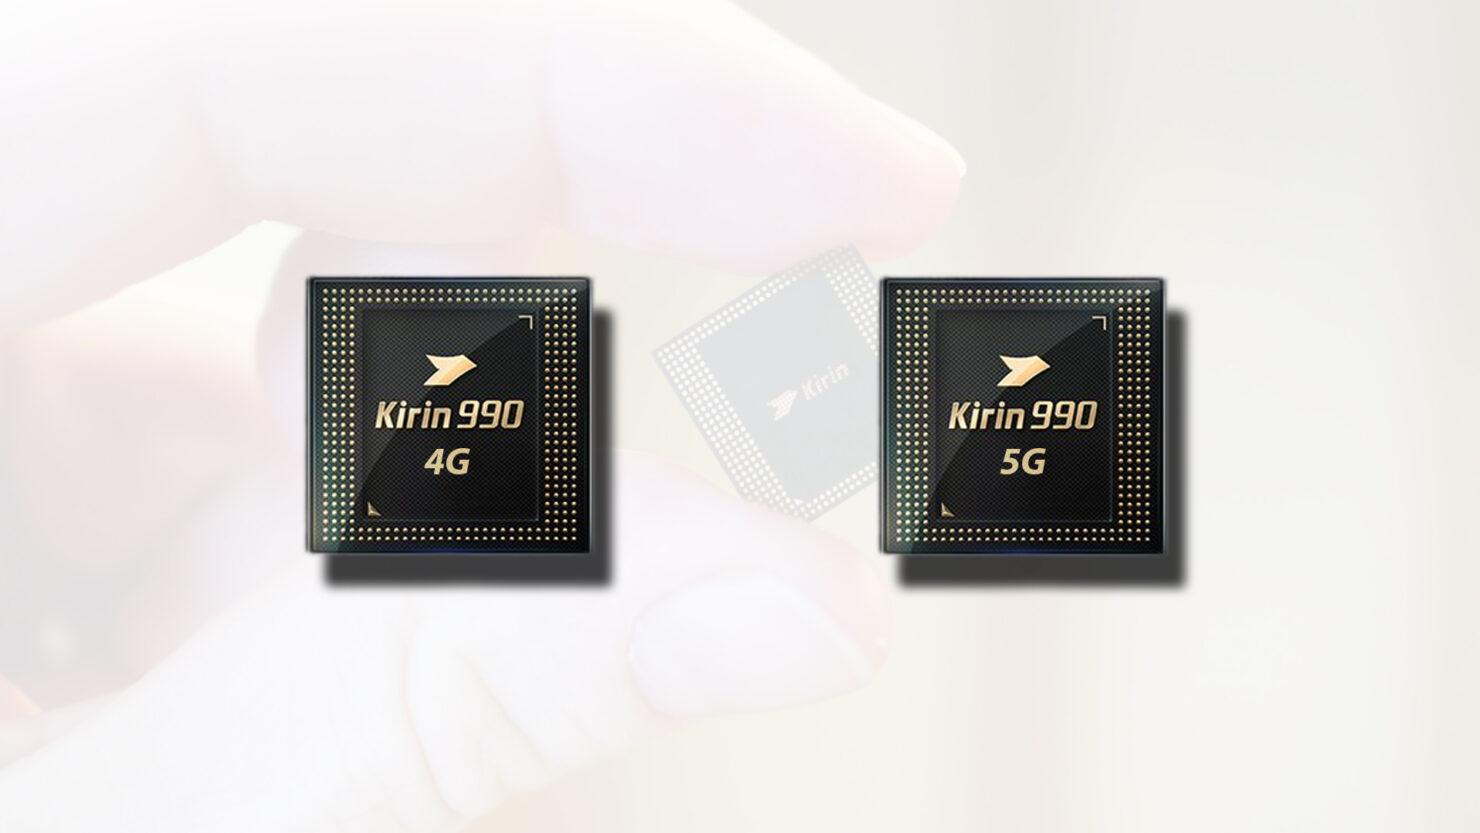 Kirin 990 4G vs Kirin 990 5G specification differences